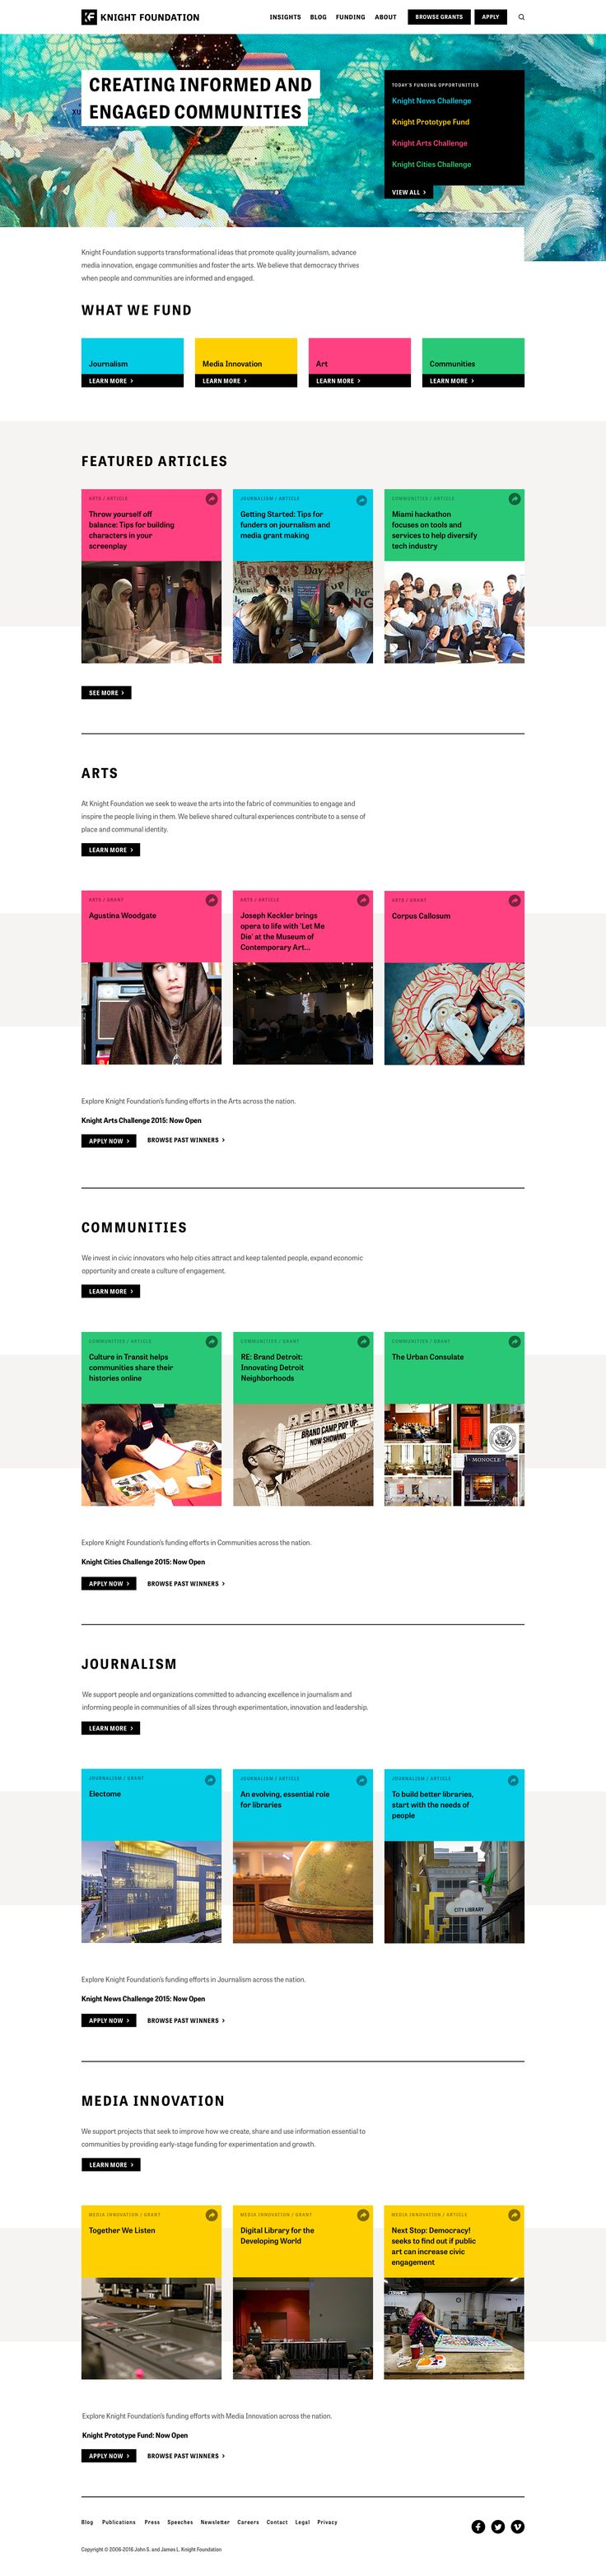 Kf homepage full 01